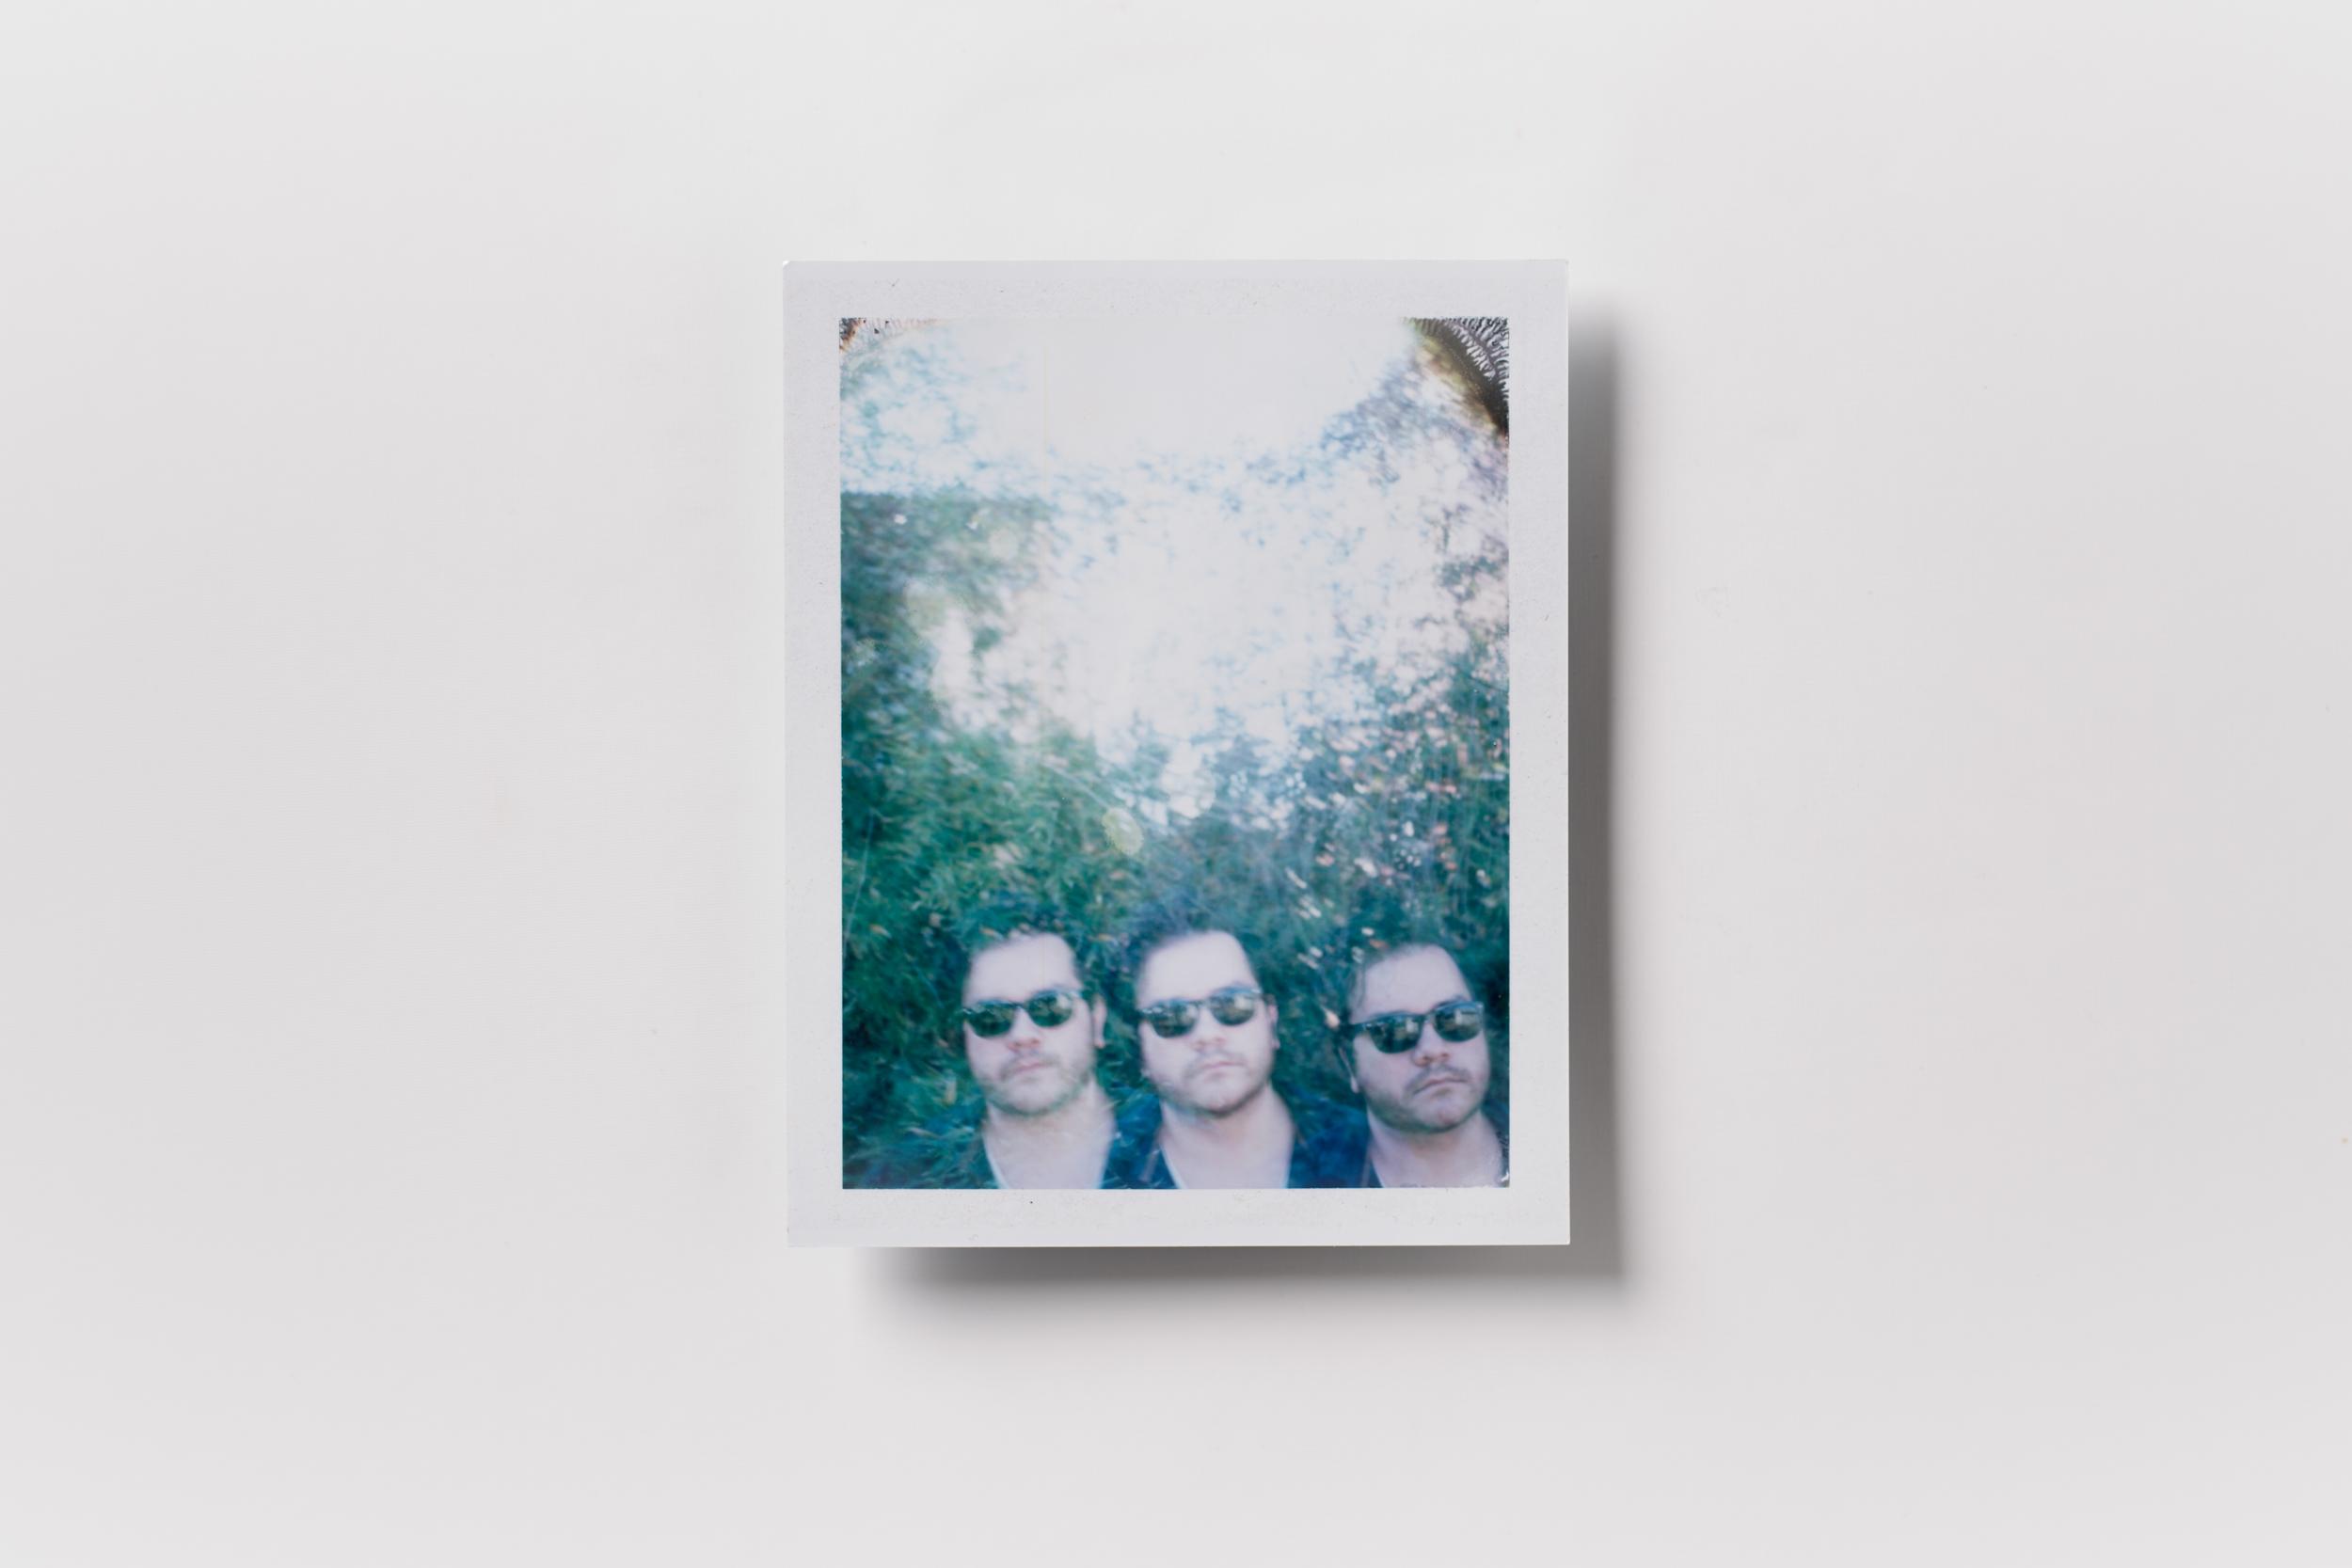 website polaroid (14 of 15).jpg